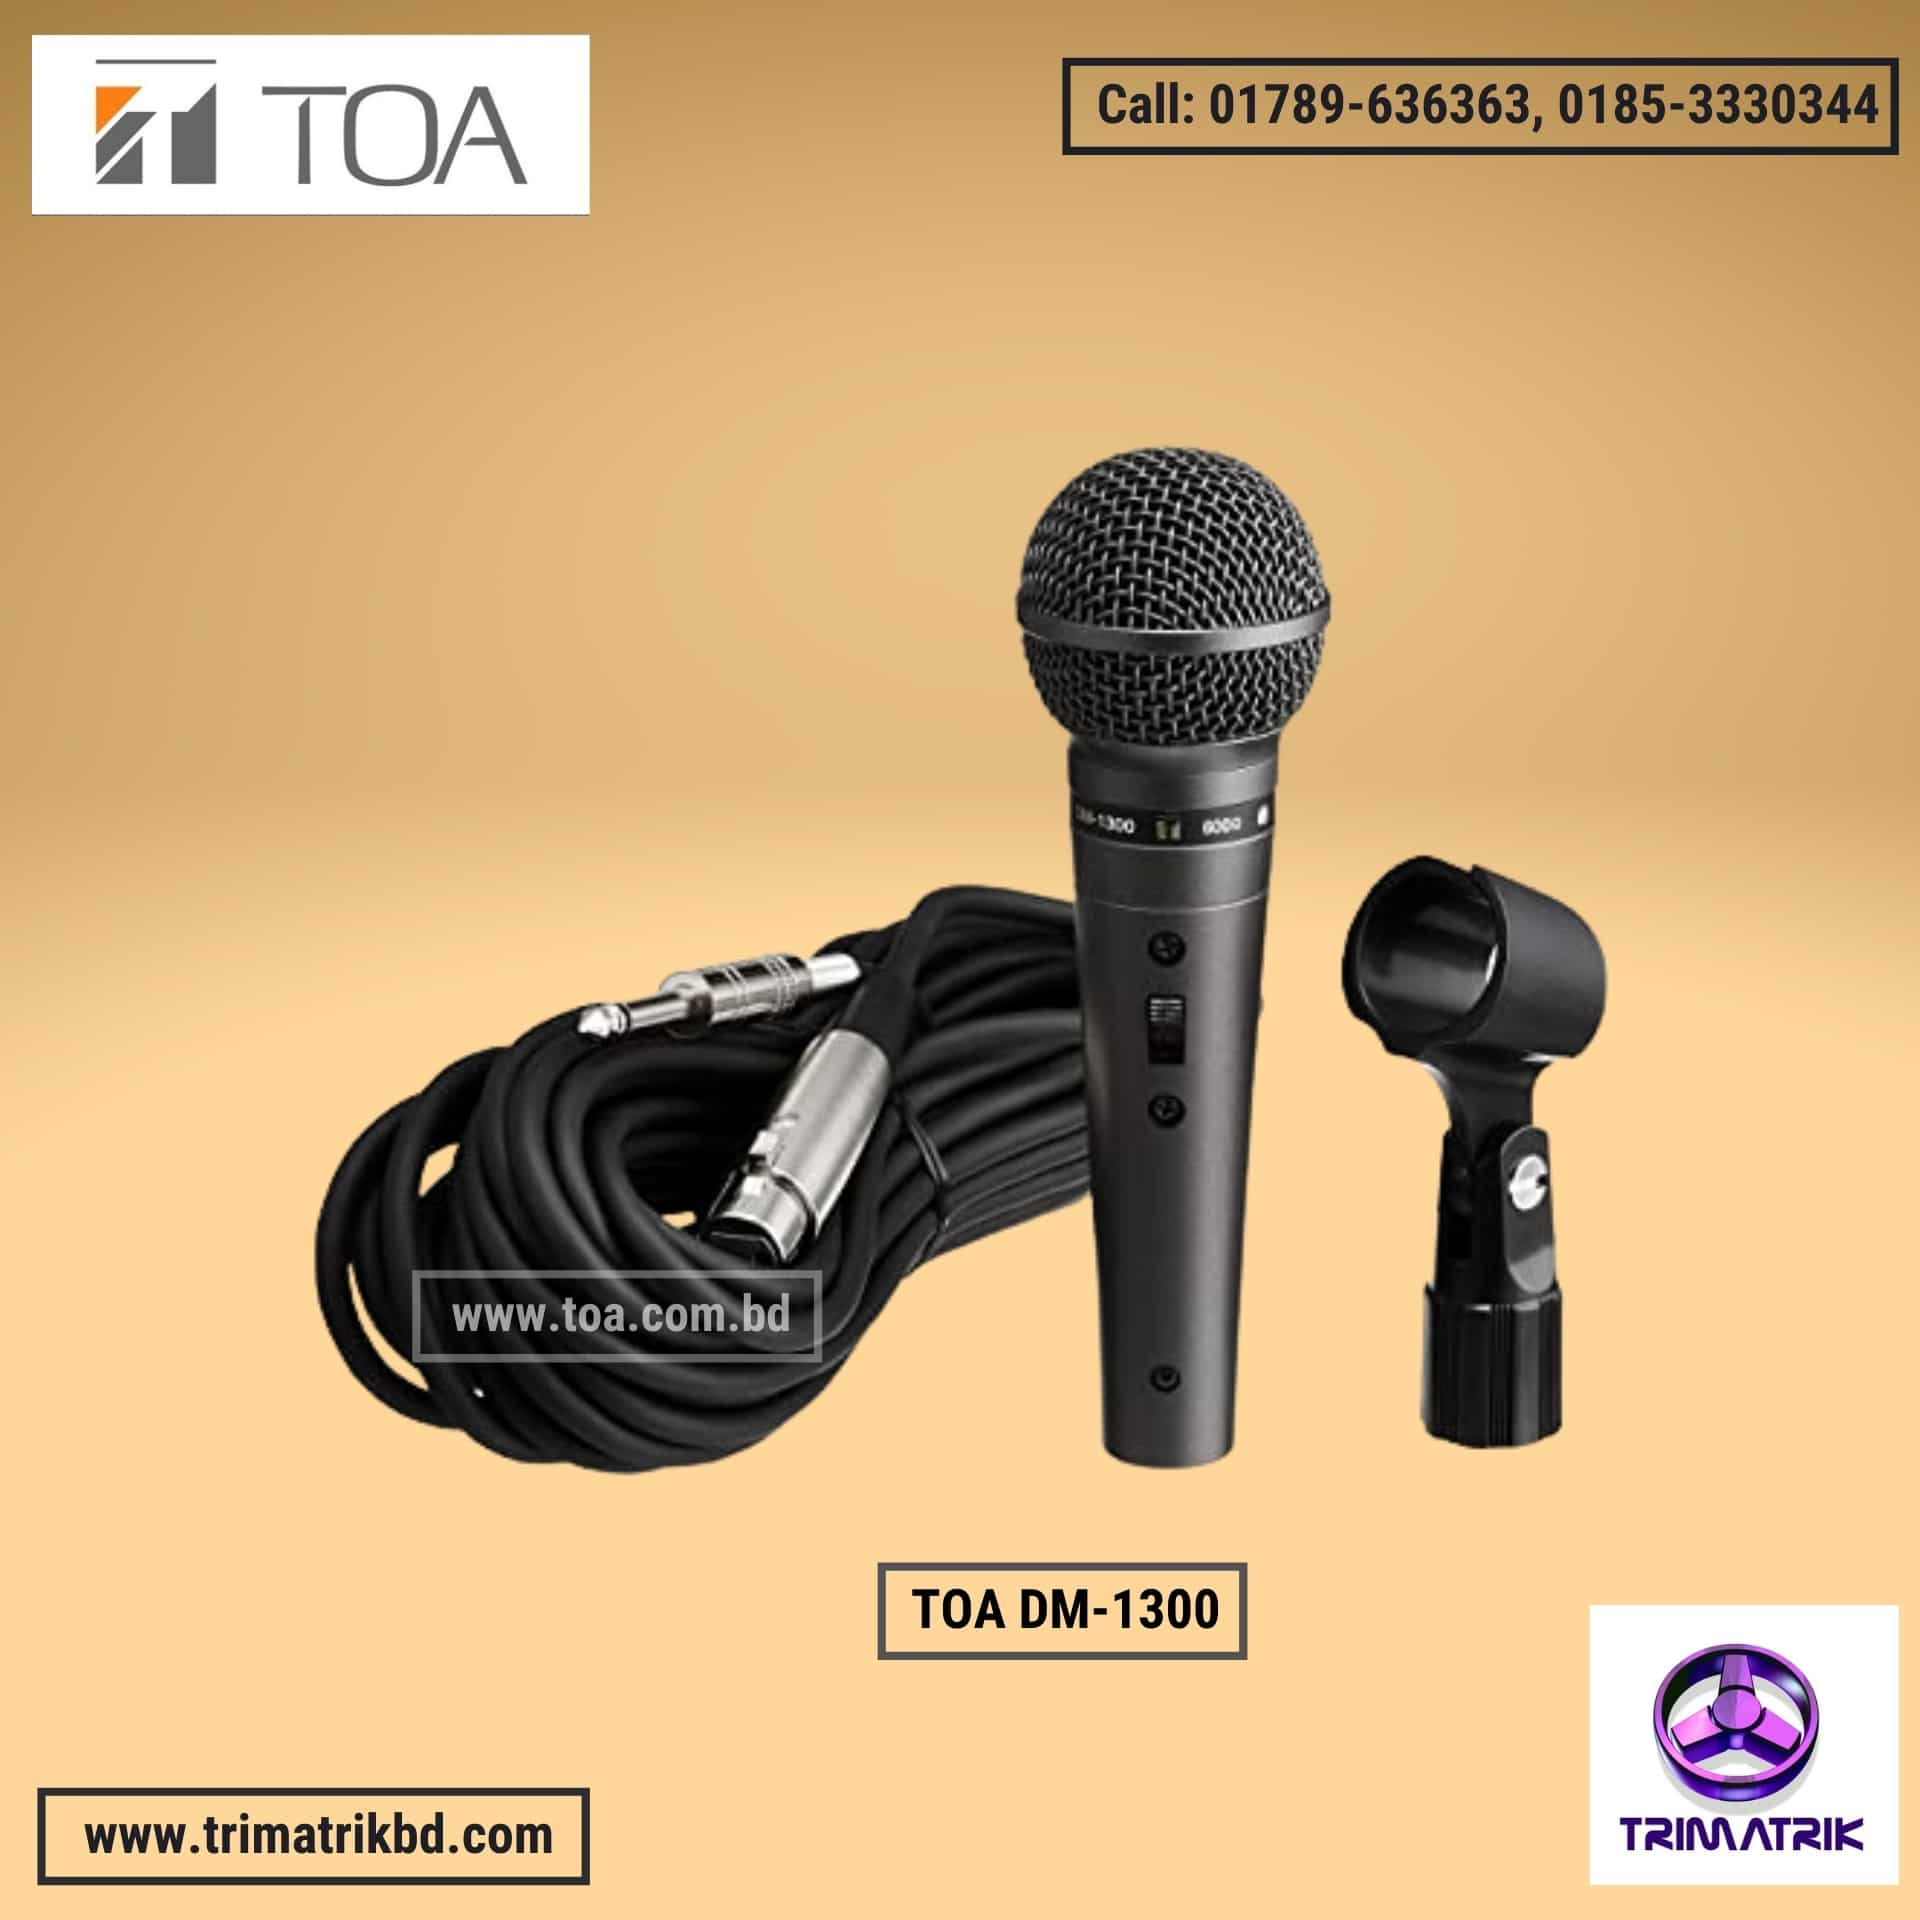 TOA DM-1300 Bangladesh | TOA DM-1300 Price in BD